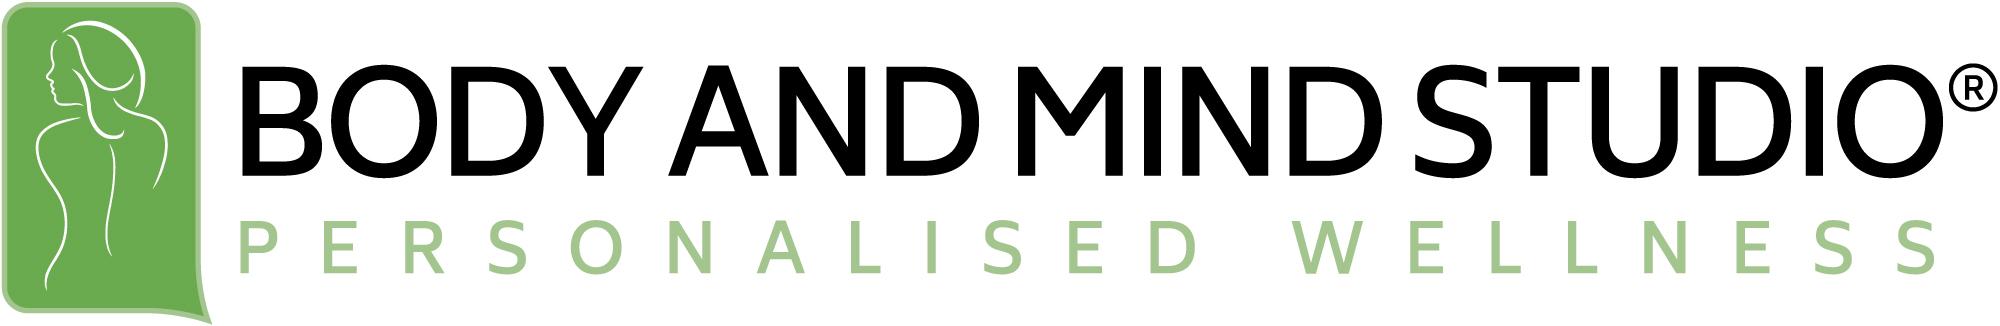 Body and Mind Studio Logo